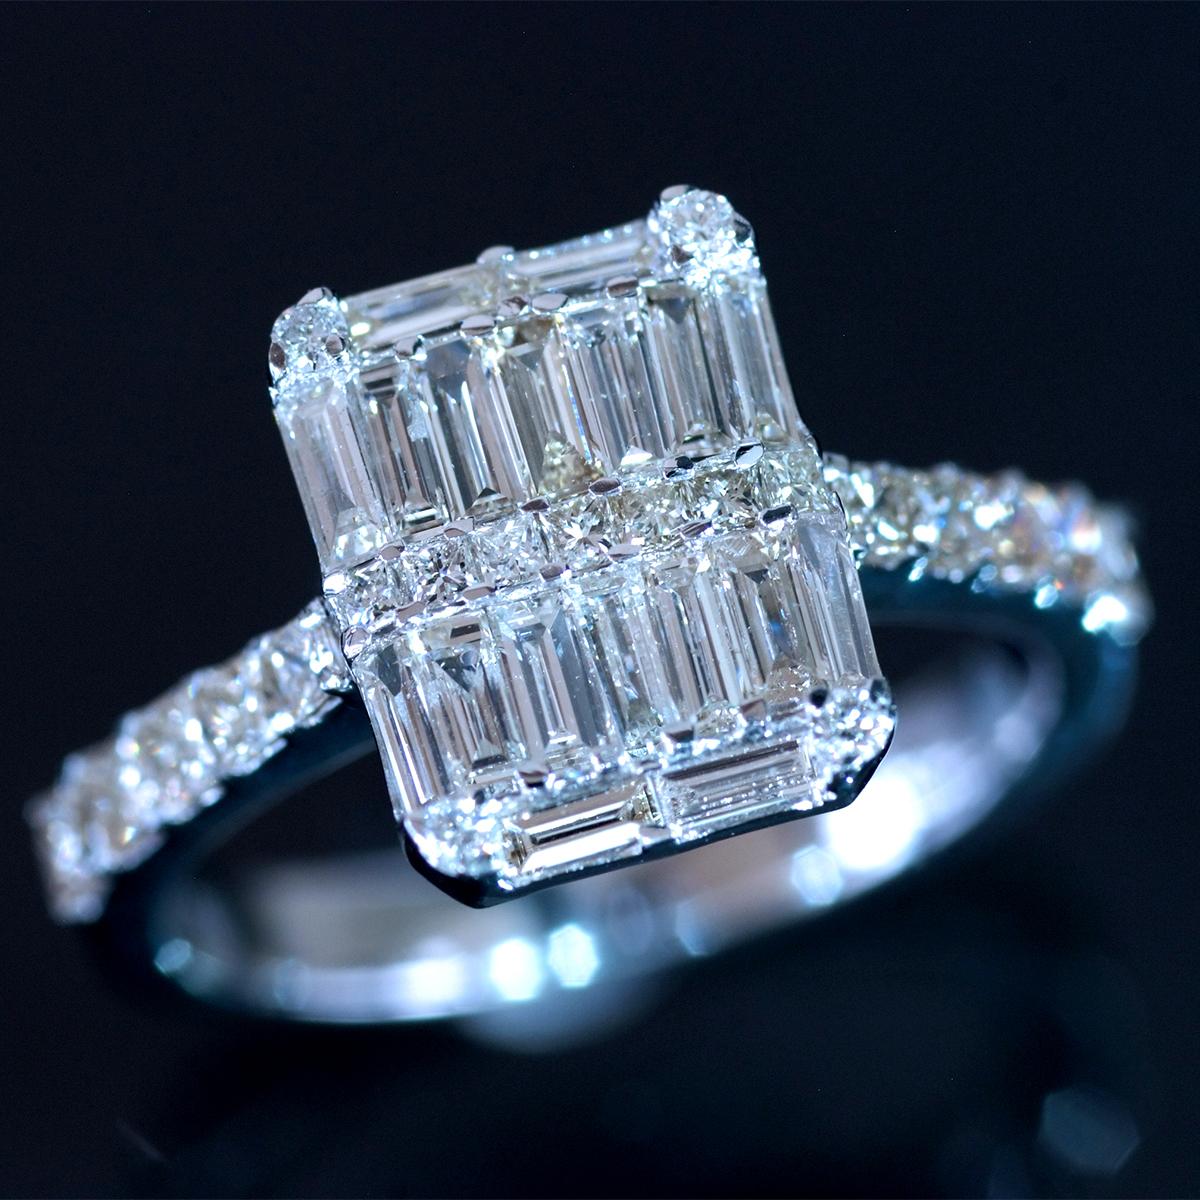 *R4482 一流メーカー令和新作モデル!婚約指輪にも! 天然上質ダイヤモンド1.13ct 最高級18金WG無垢R S12號 総重量3.5g 幅11.5mm